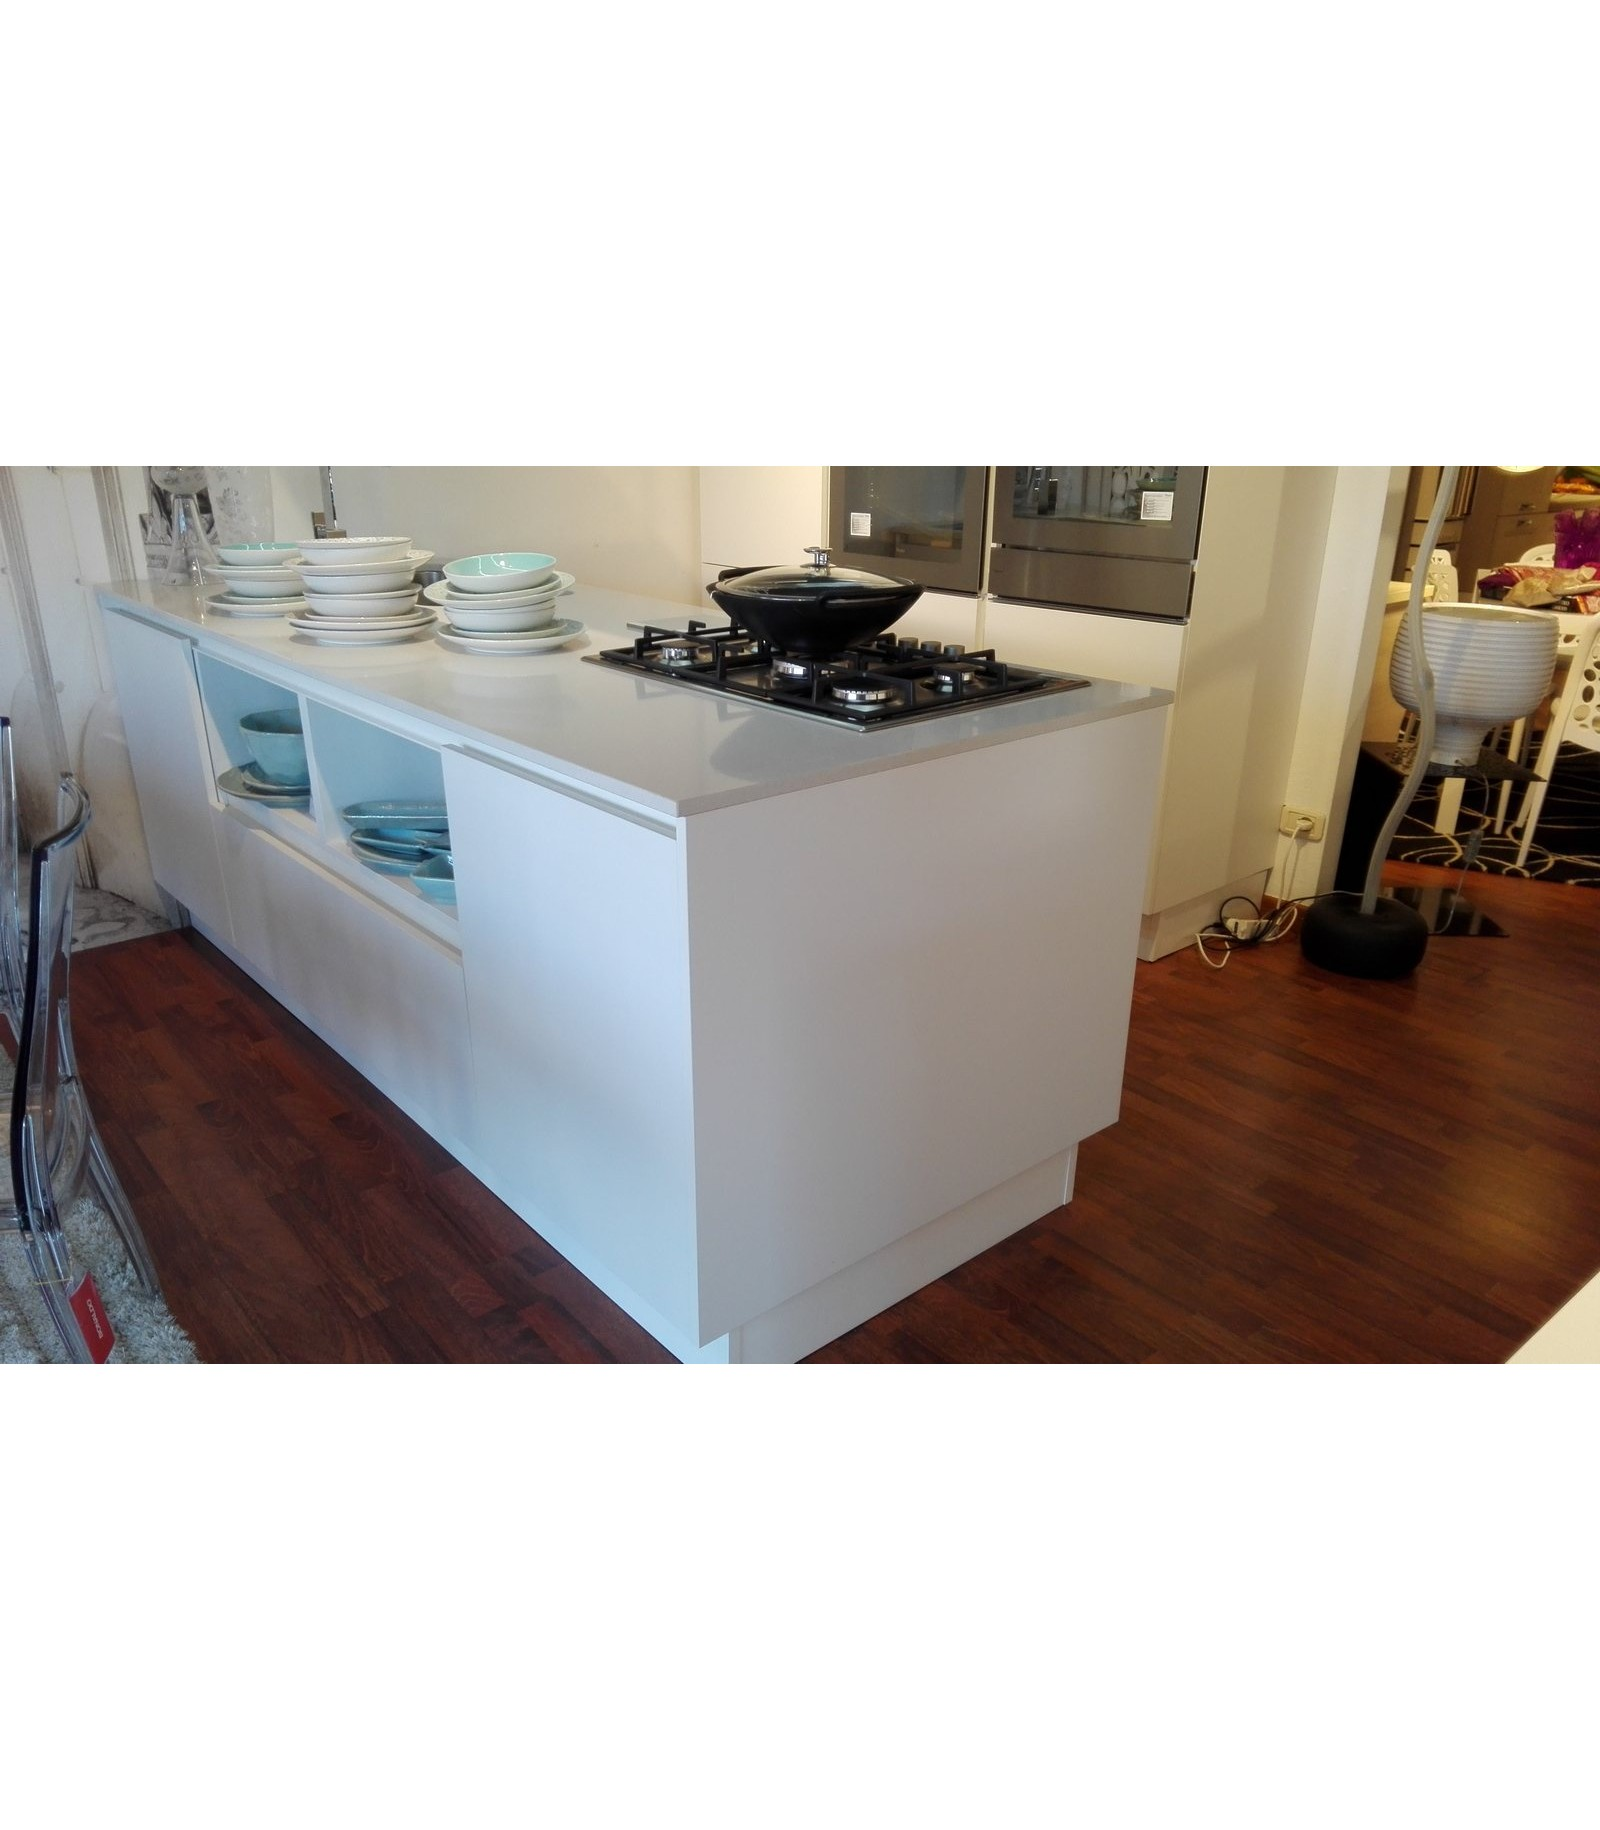 Outlet Cucine Veneta Cucine.Cucina Sistematica Pet By Veneta Cucine Outlet Mariotti Casa